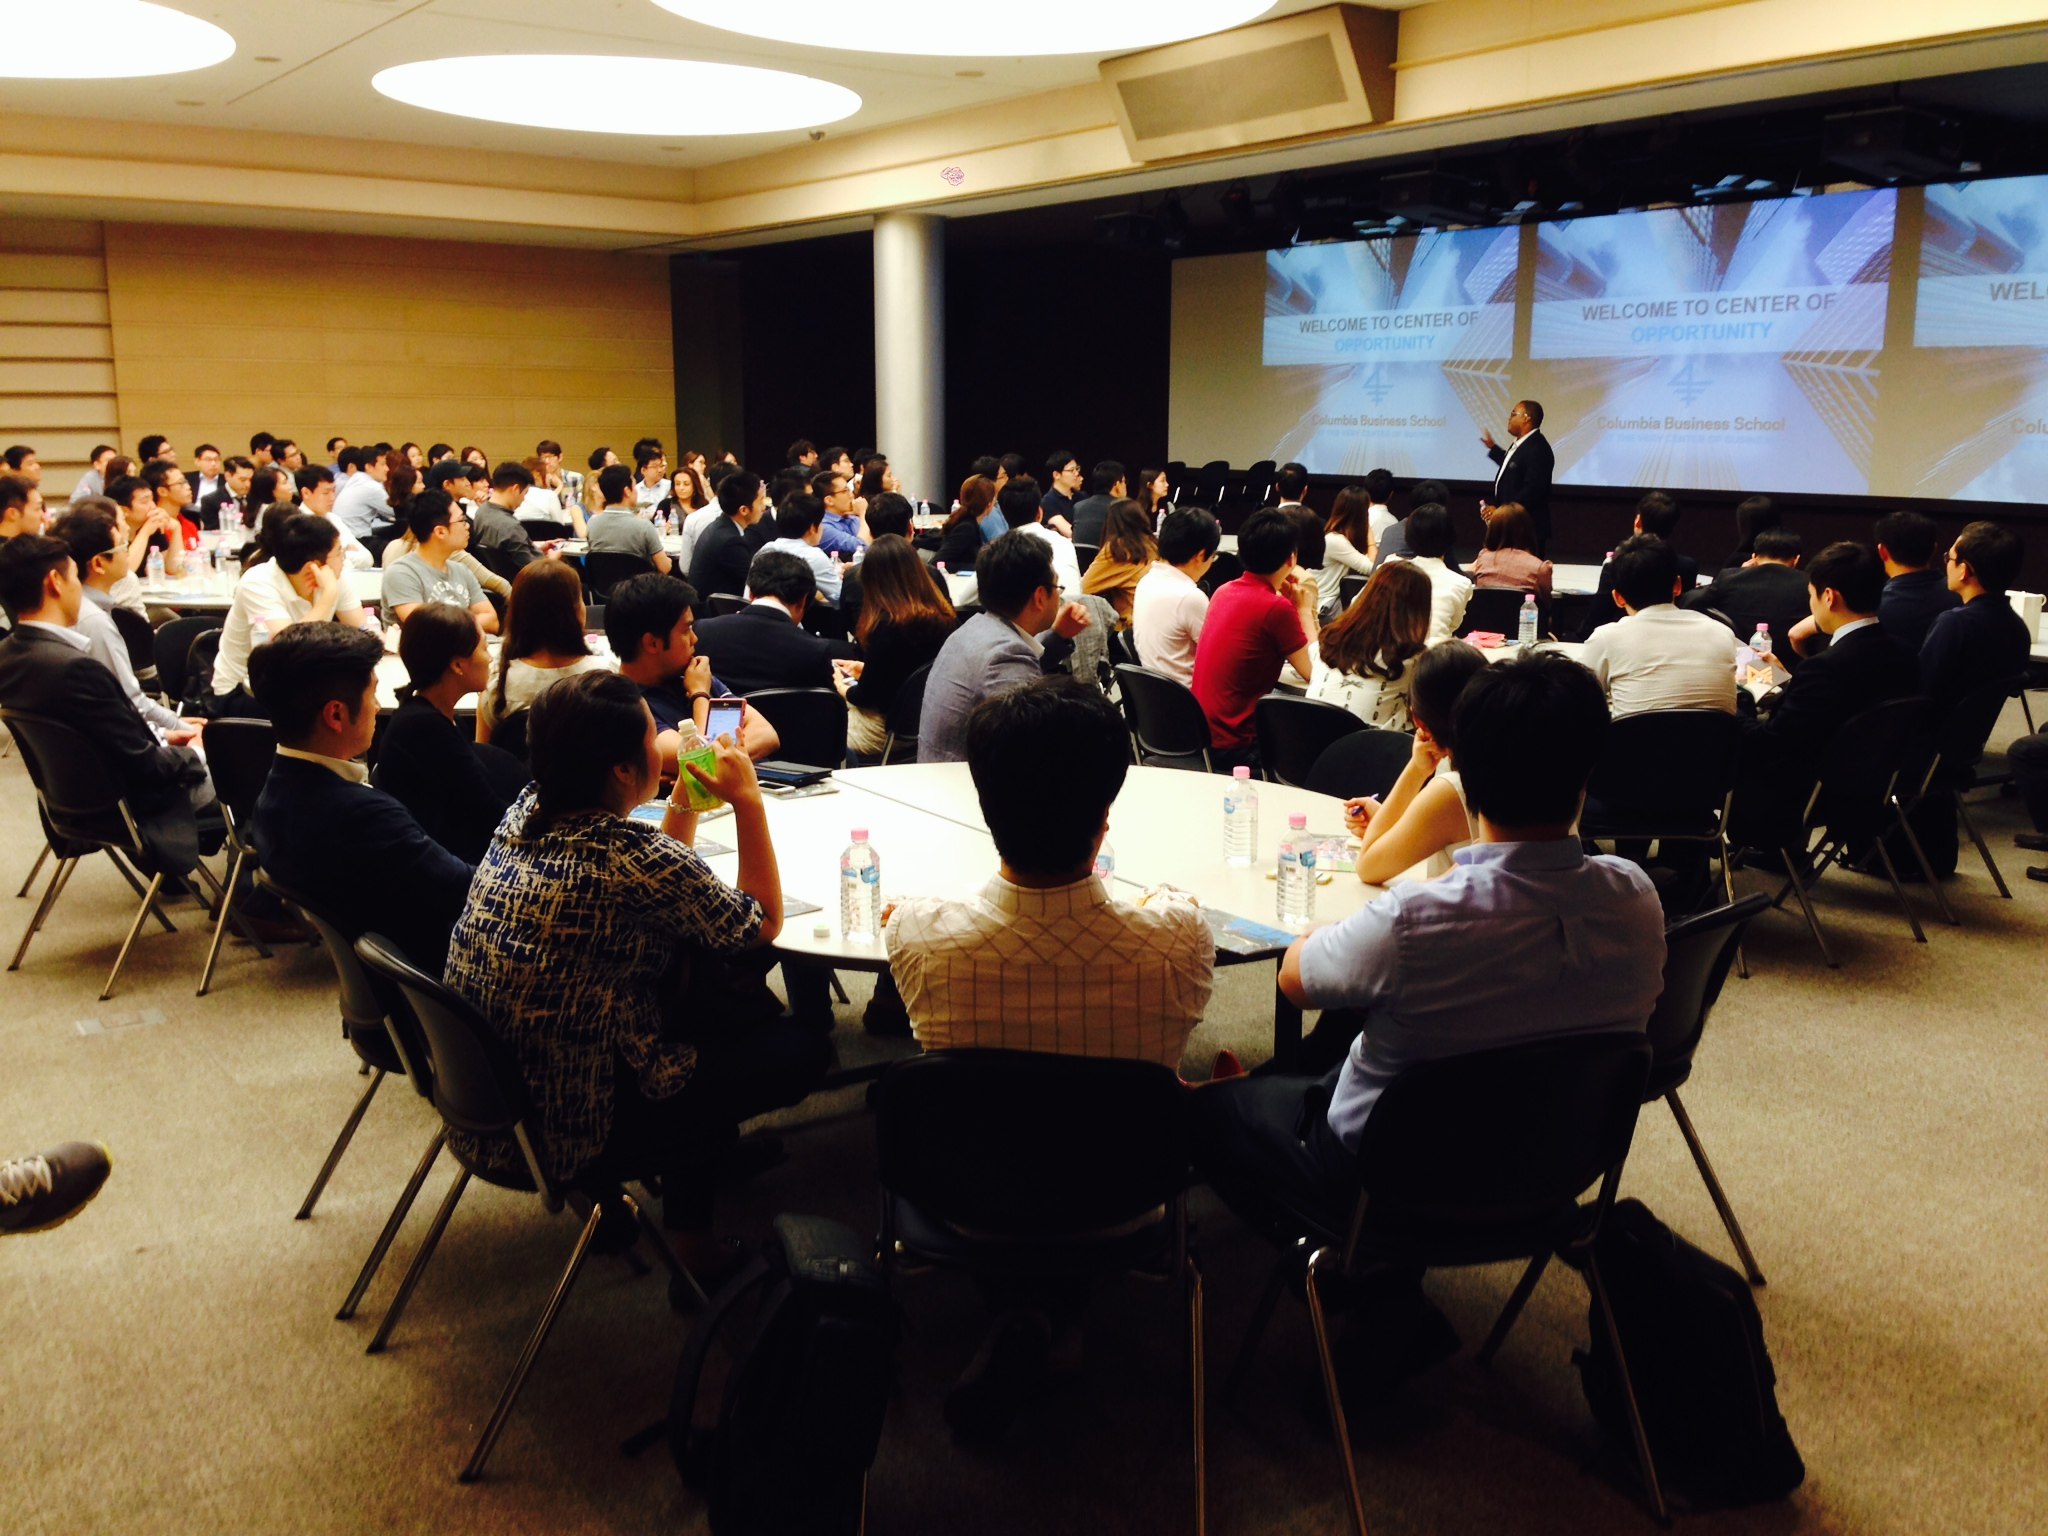 CBS_Info_Session_1.JPG